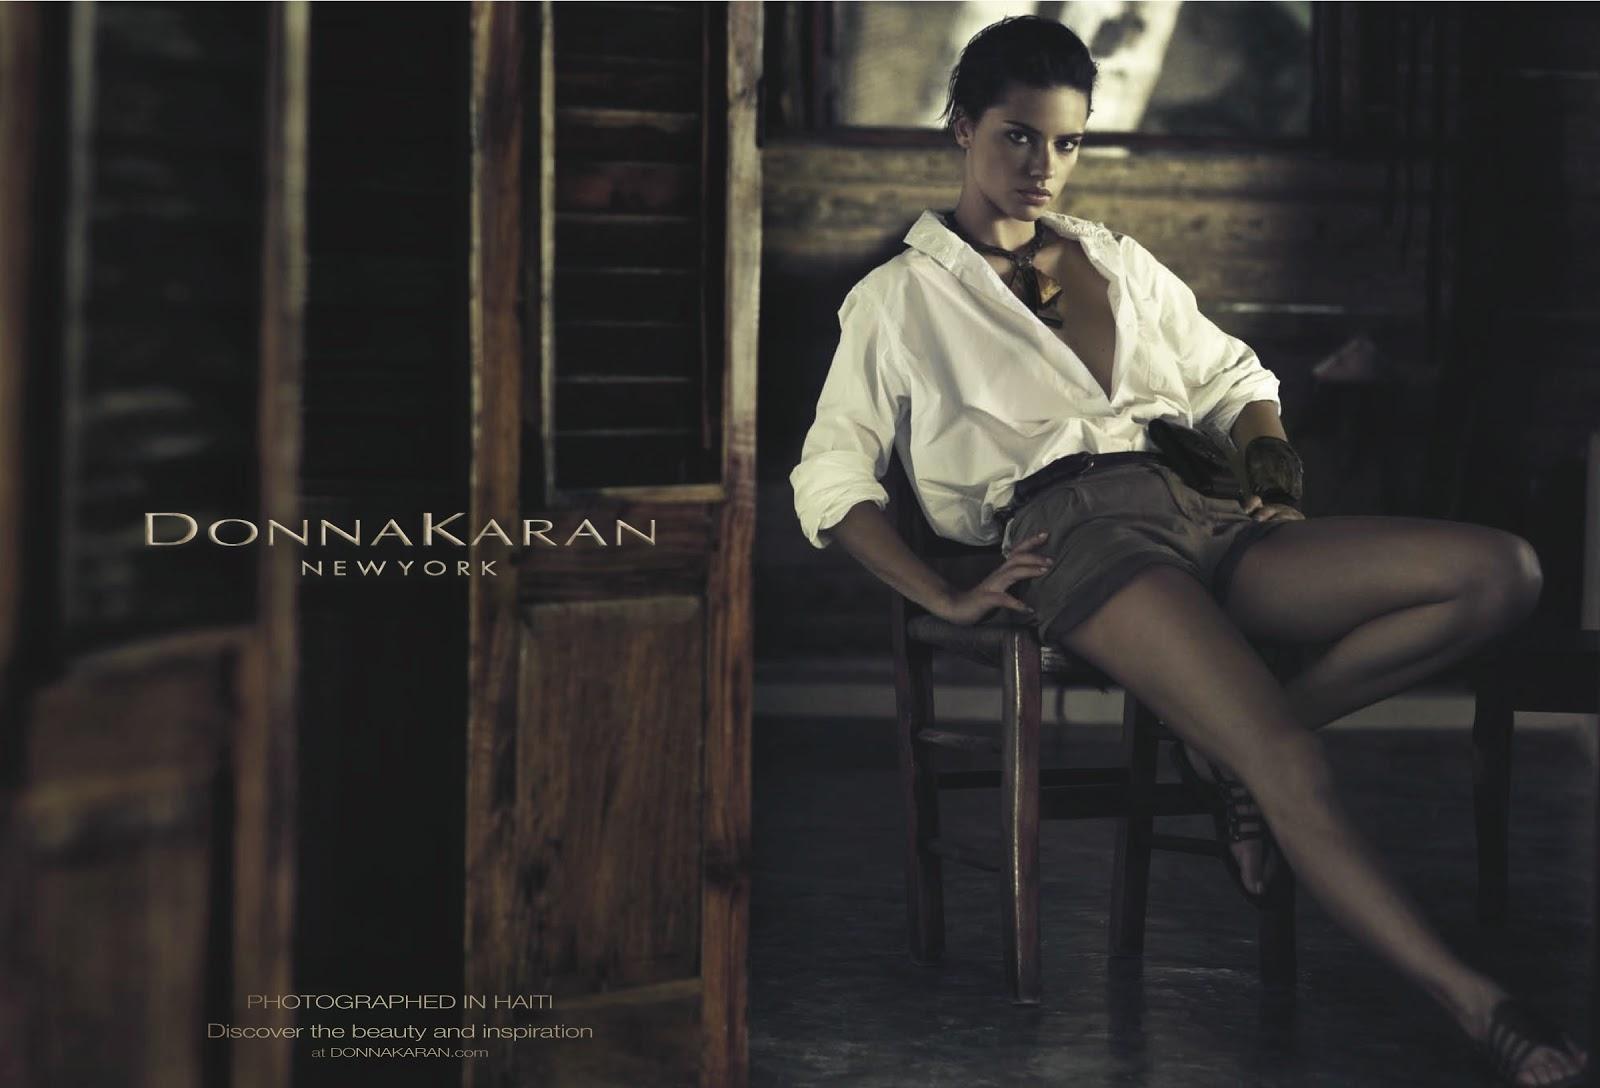 donna-karan-spring-2012-campaign-2